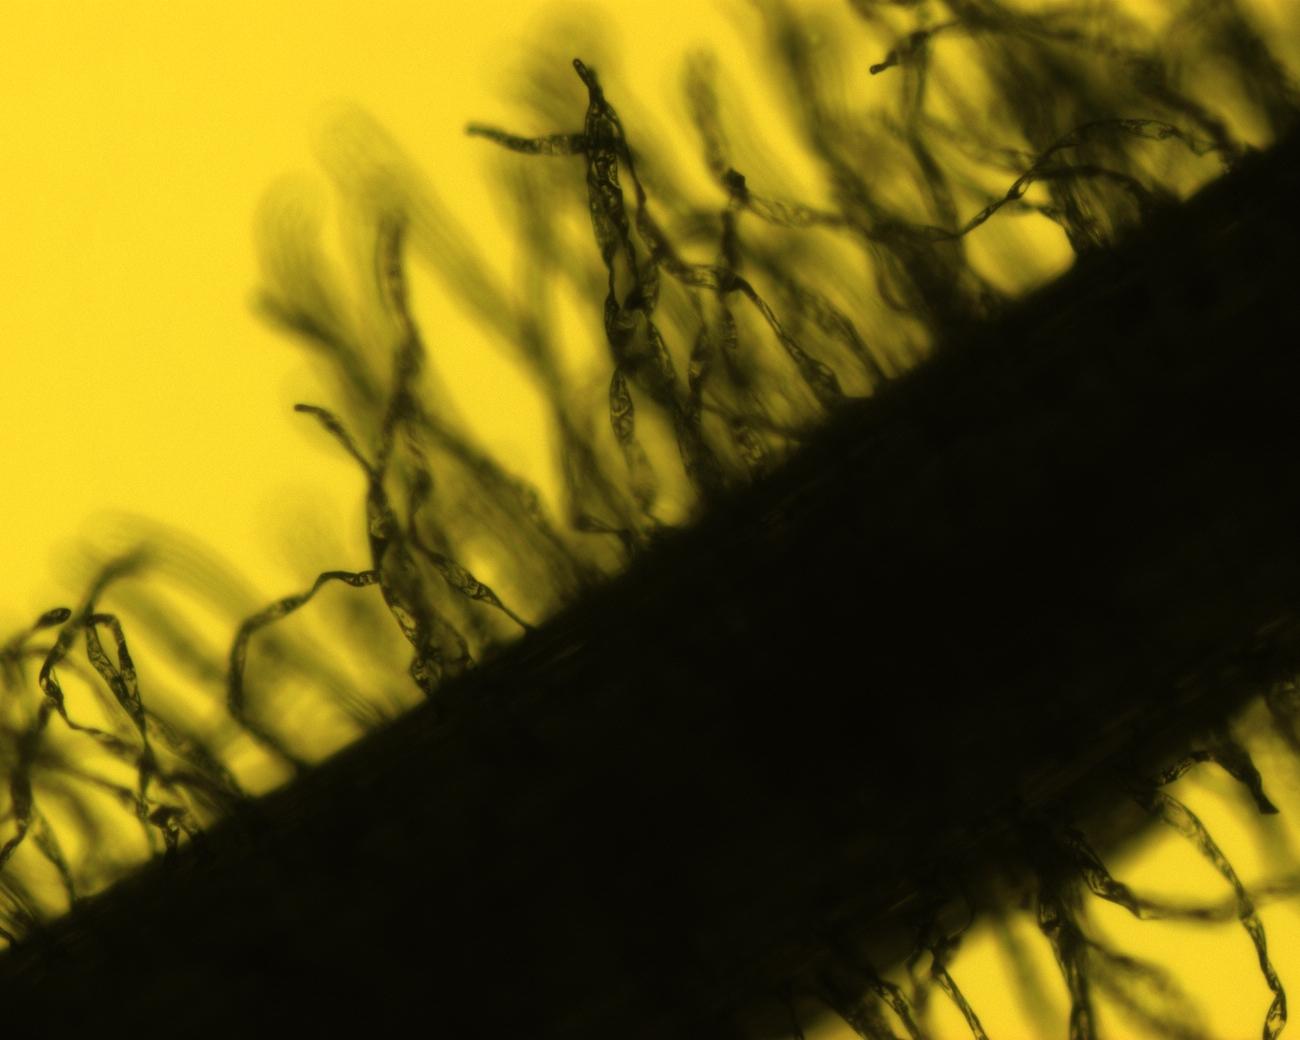 Z. formosa seedling root 4x 3.jpg